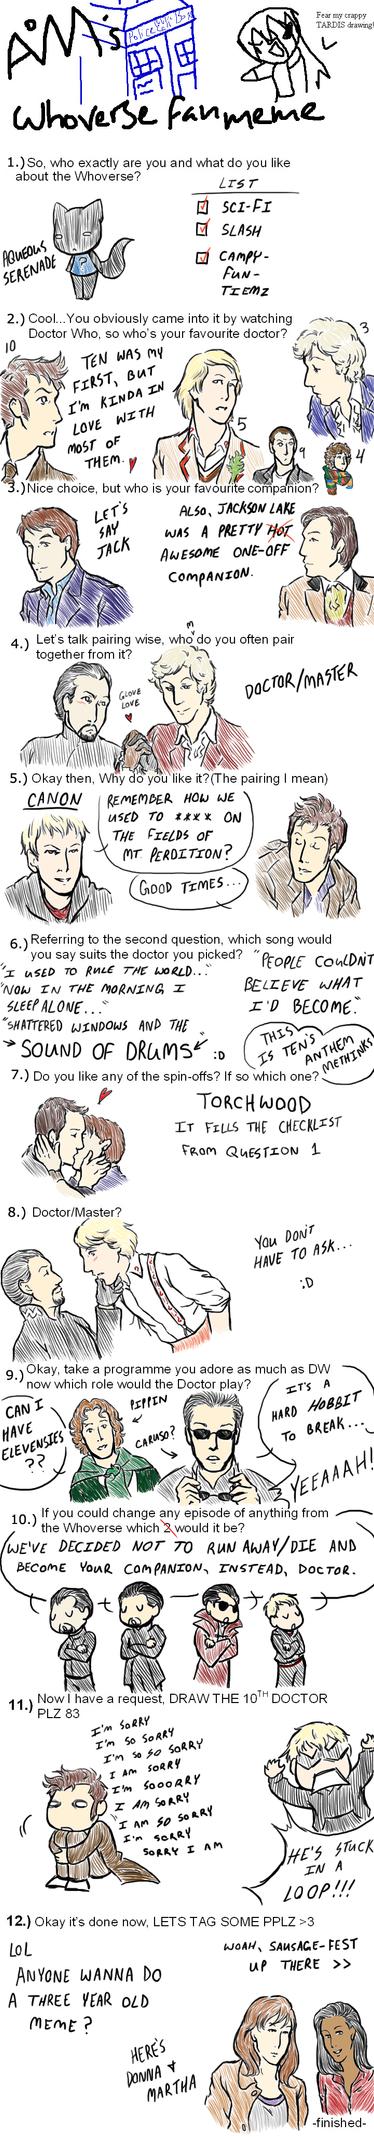 Doctor Who Meme by AqueousSerenade